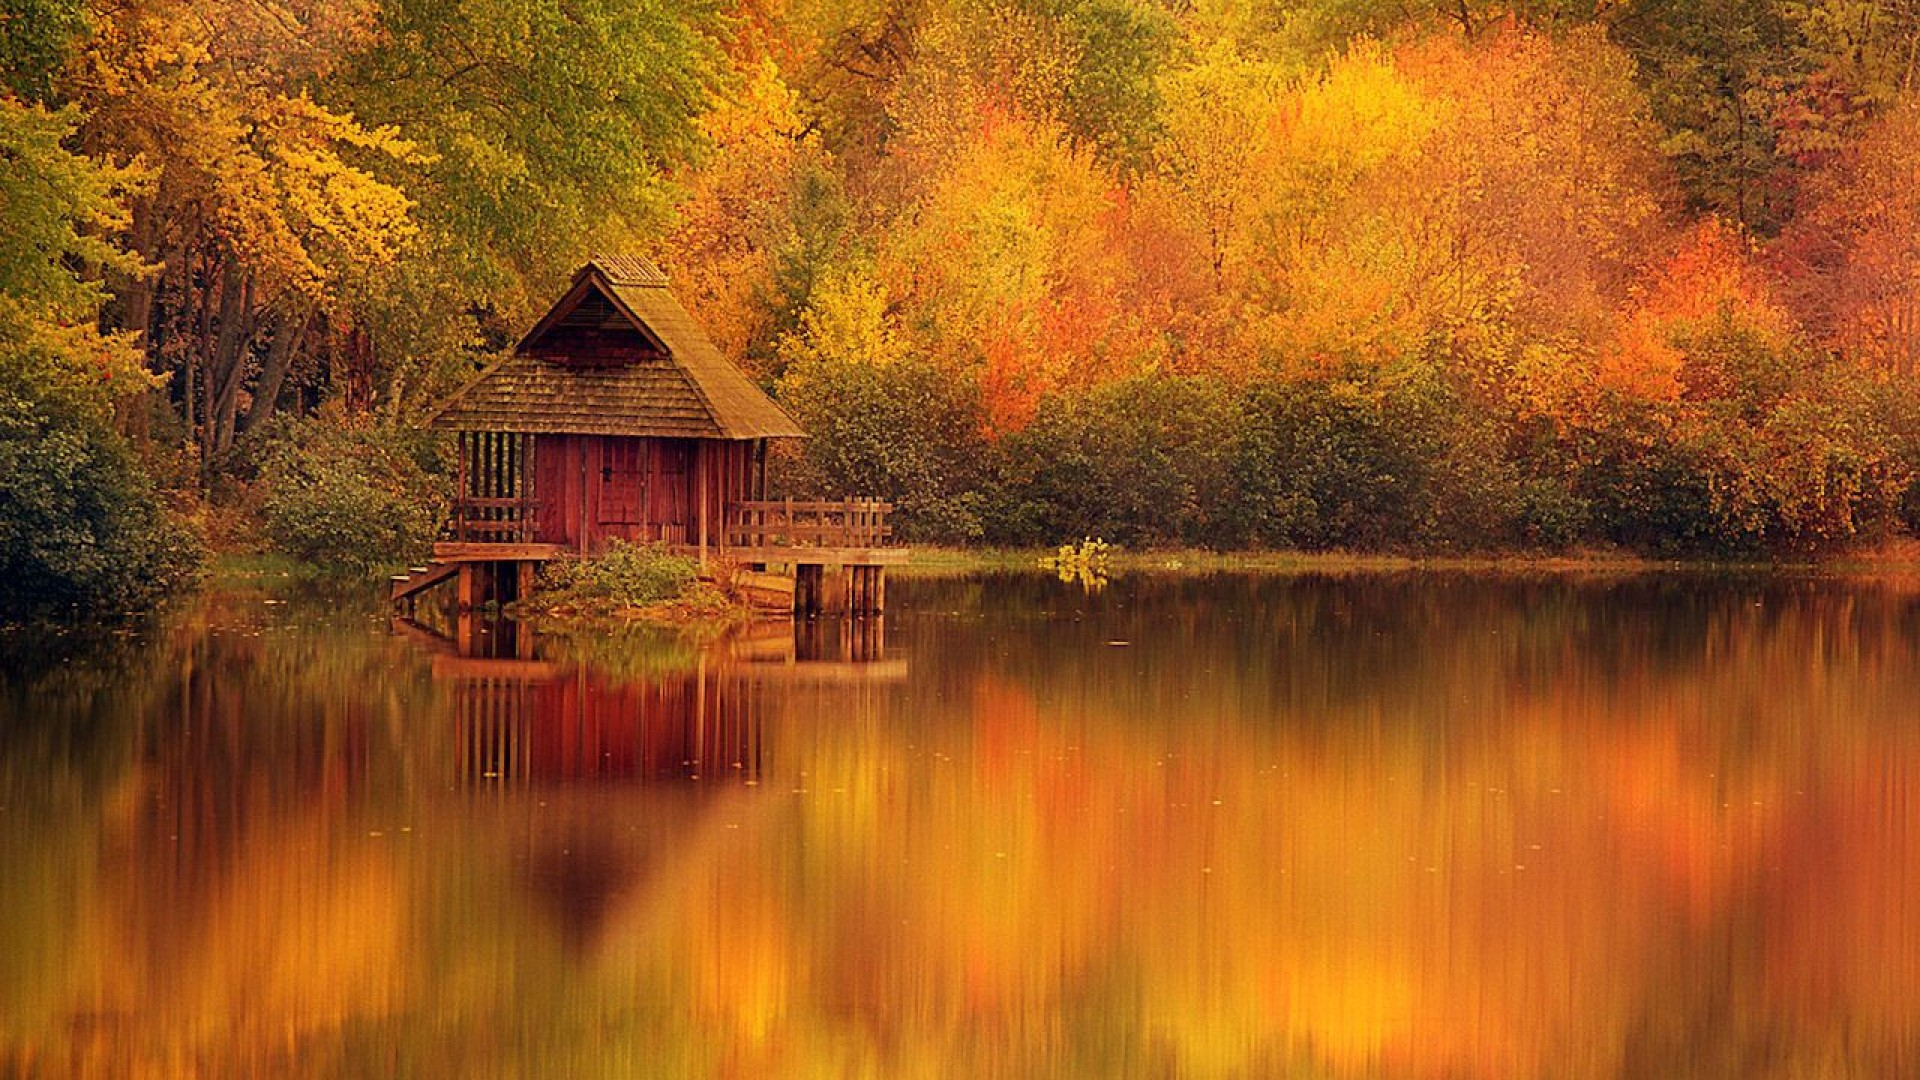 http://on-desktop.com/wps/Nature___Seasons___Autumn_the_lake_in_autumn_HD_046231_.jpg